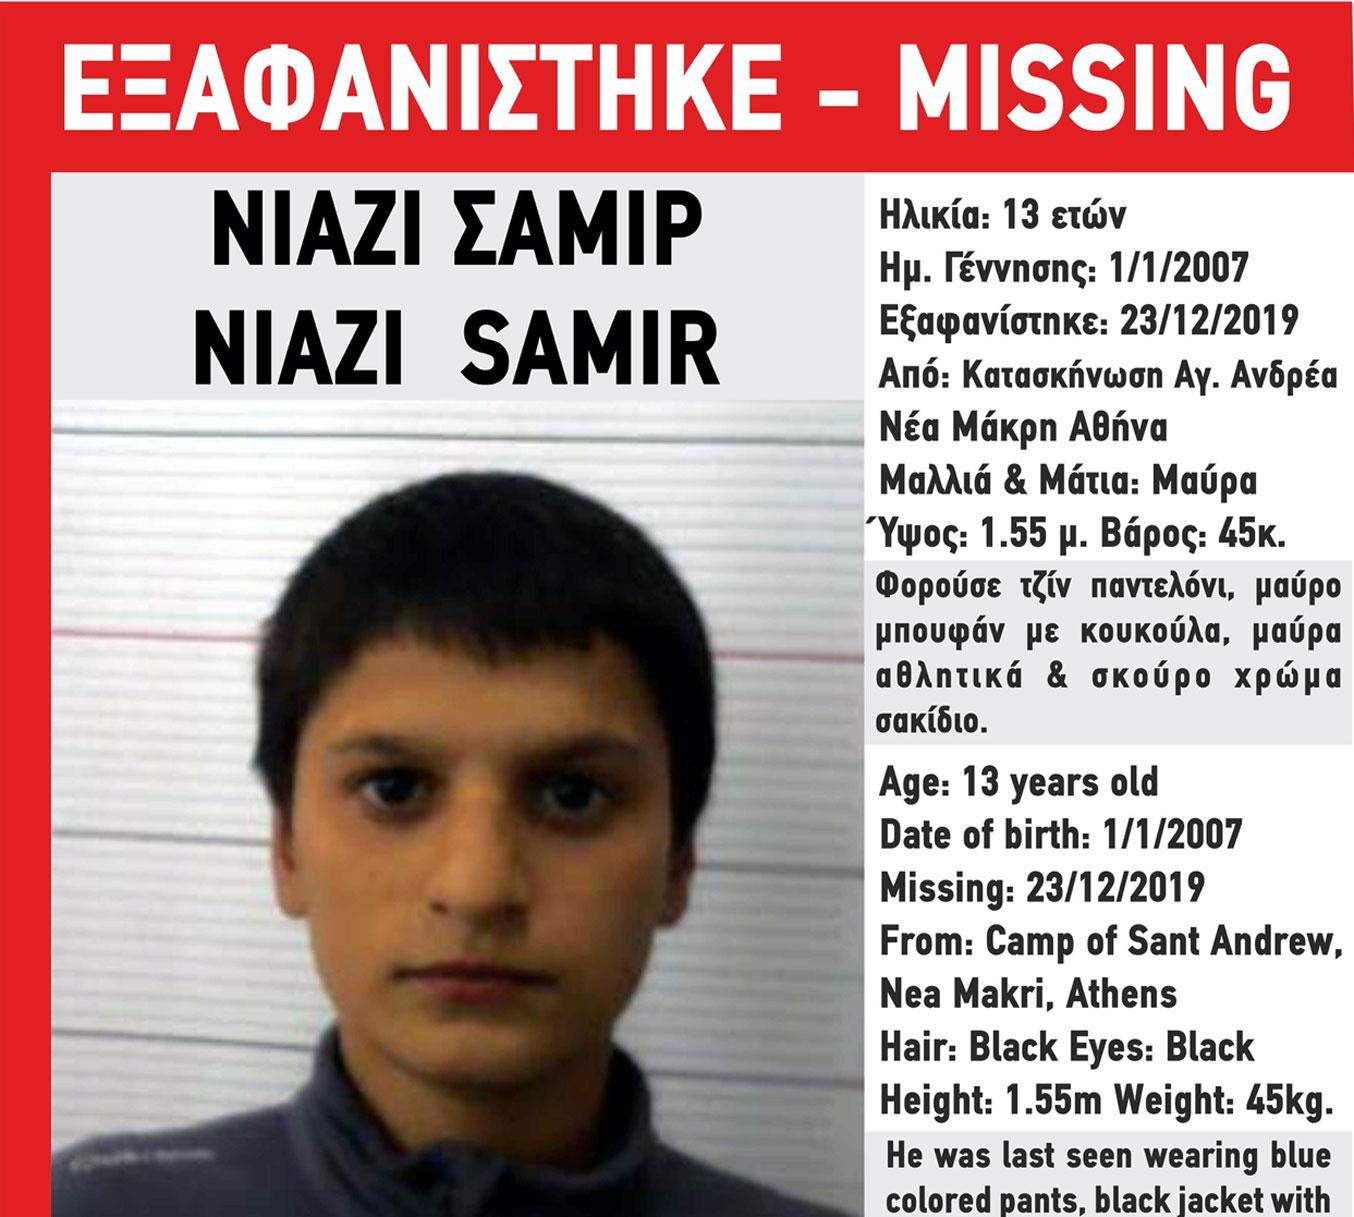 Missing Alert για τον 13χρονο Σαμίρ Νιαζί! Εξαφανίστηκε από τη Νέα Μάκρη